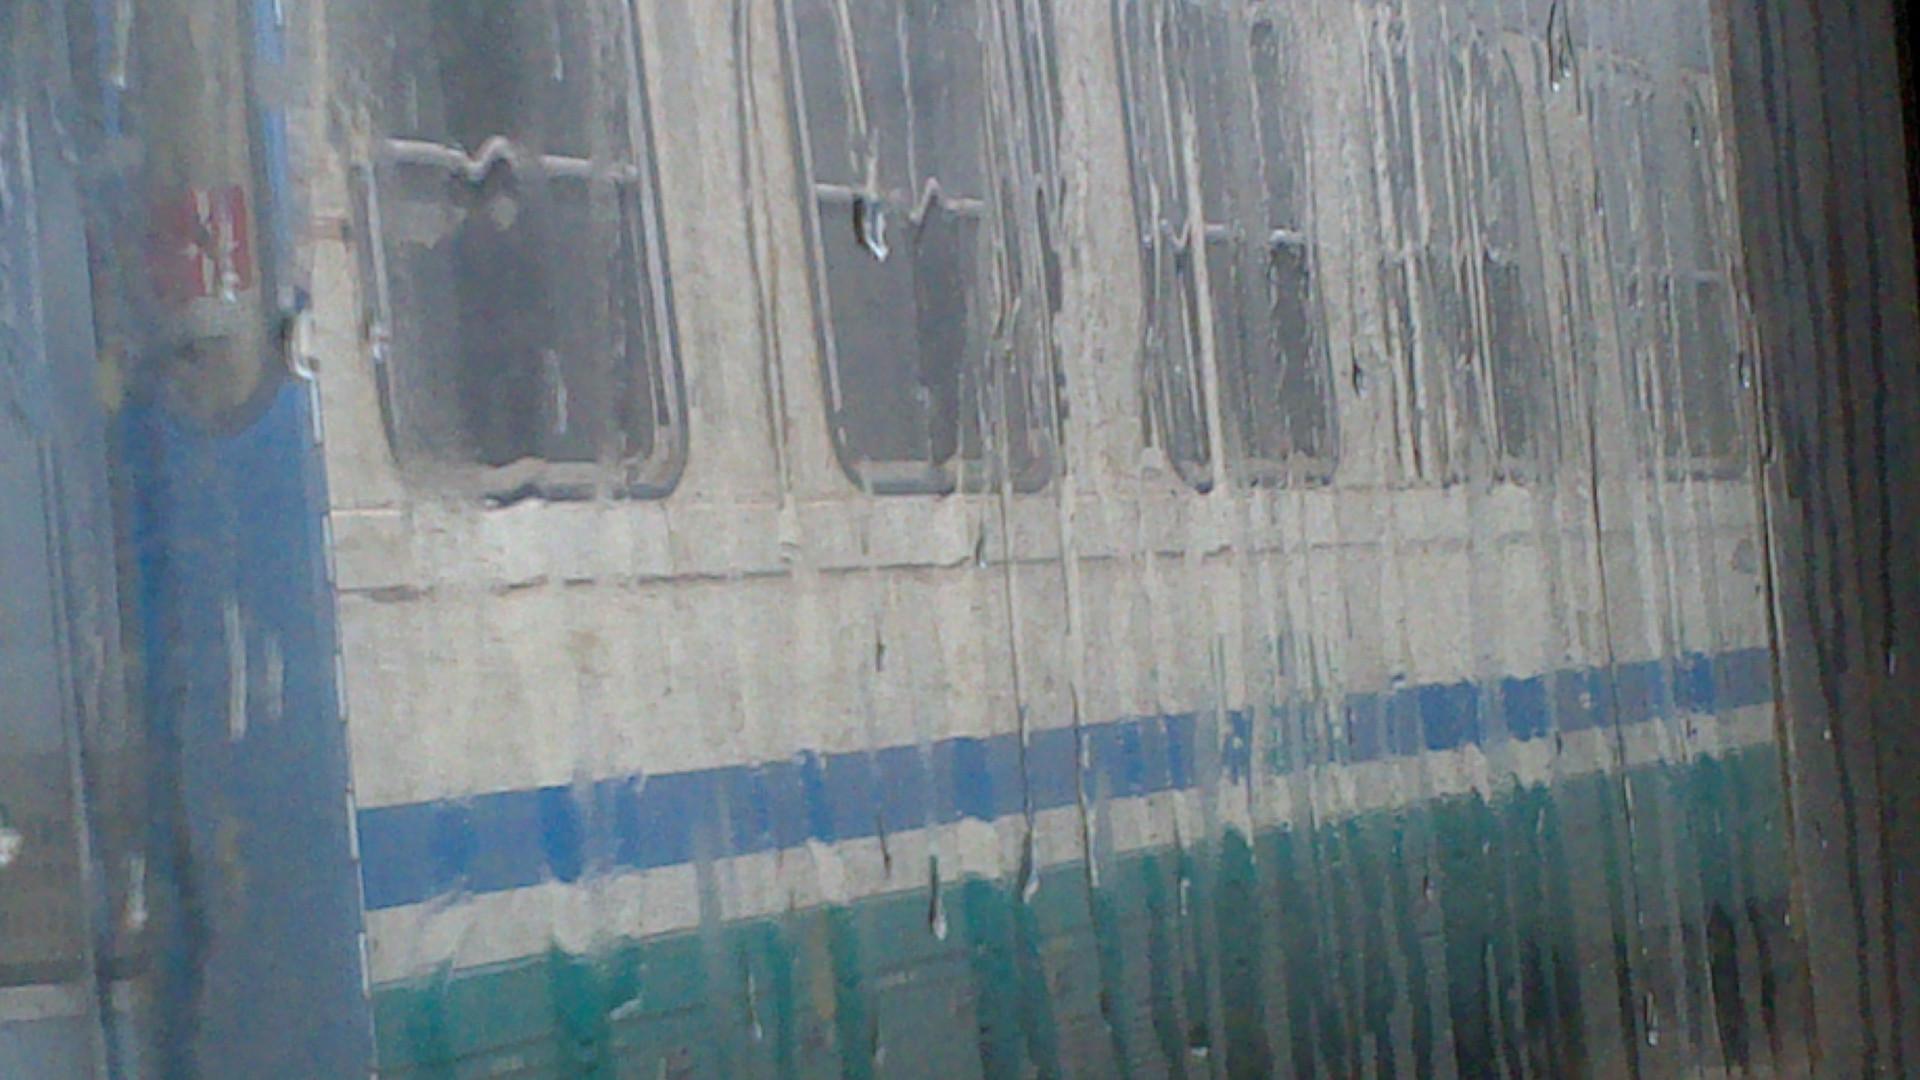 Vagoni sotto la pioggia